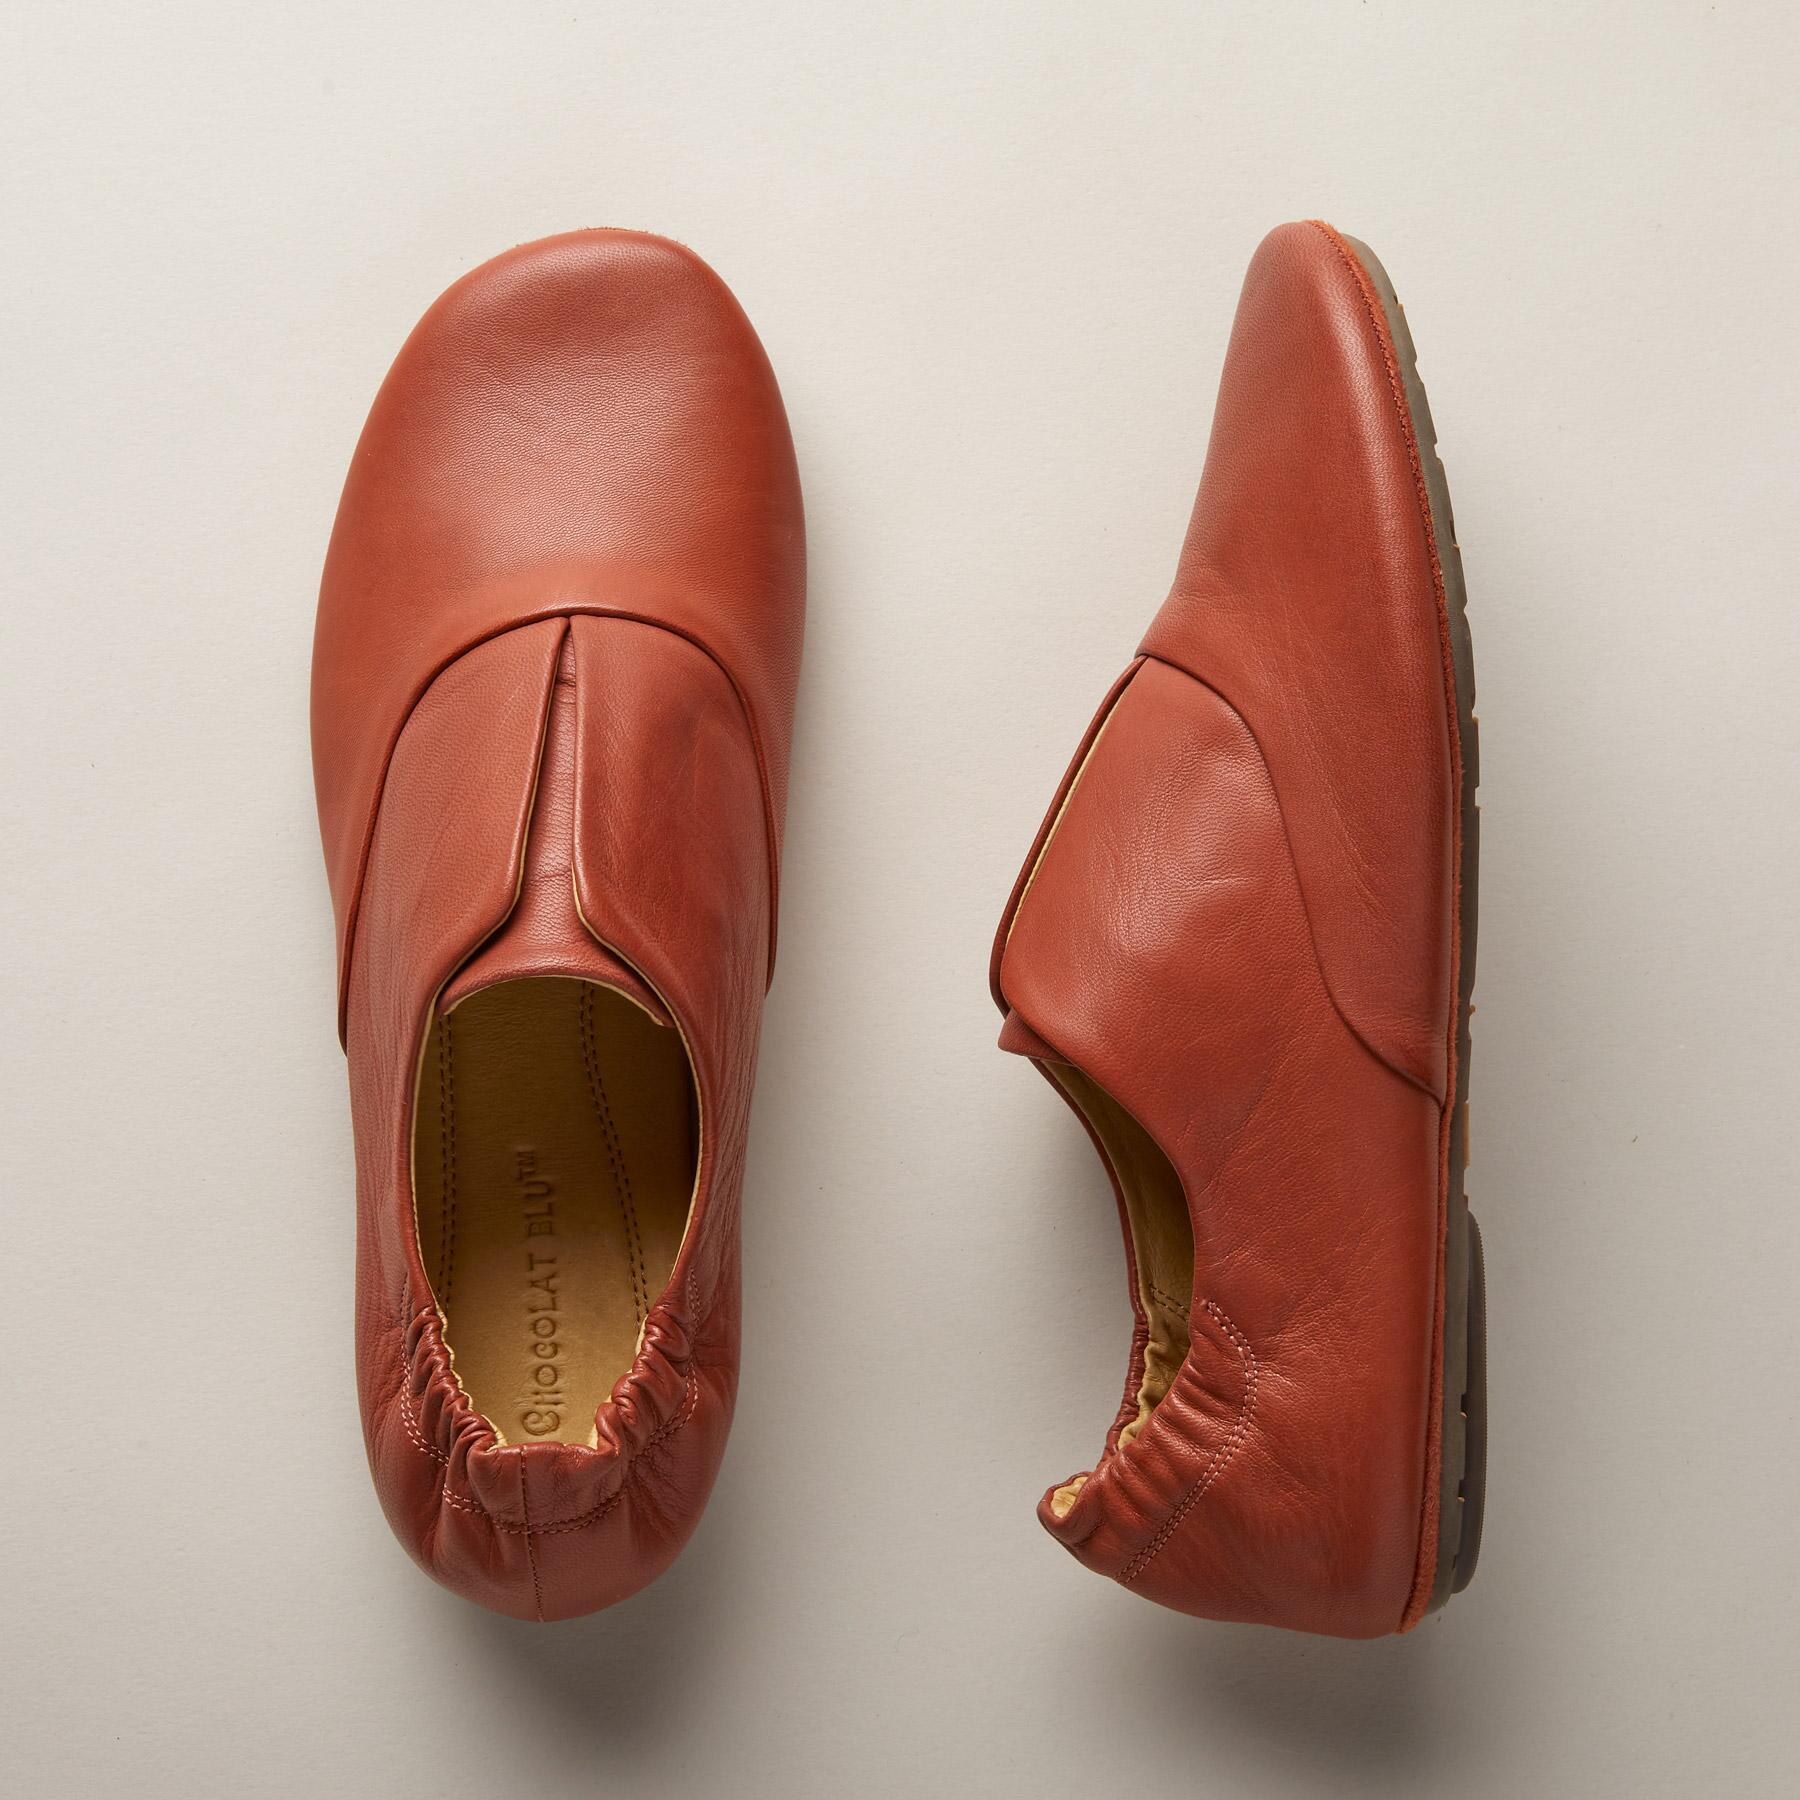 Madrona Shoes